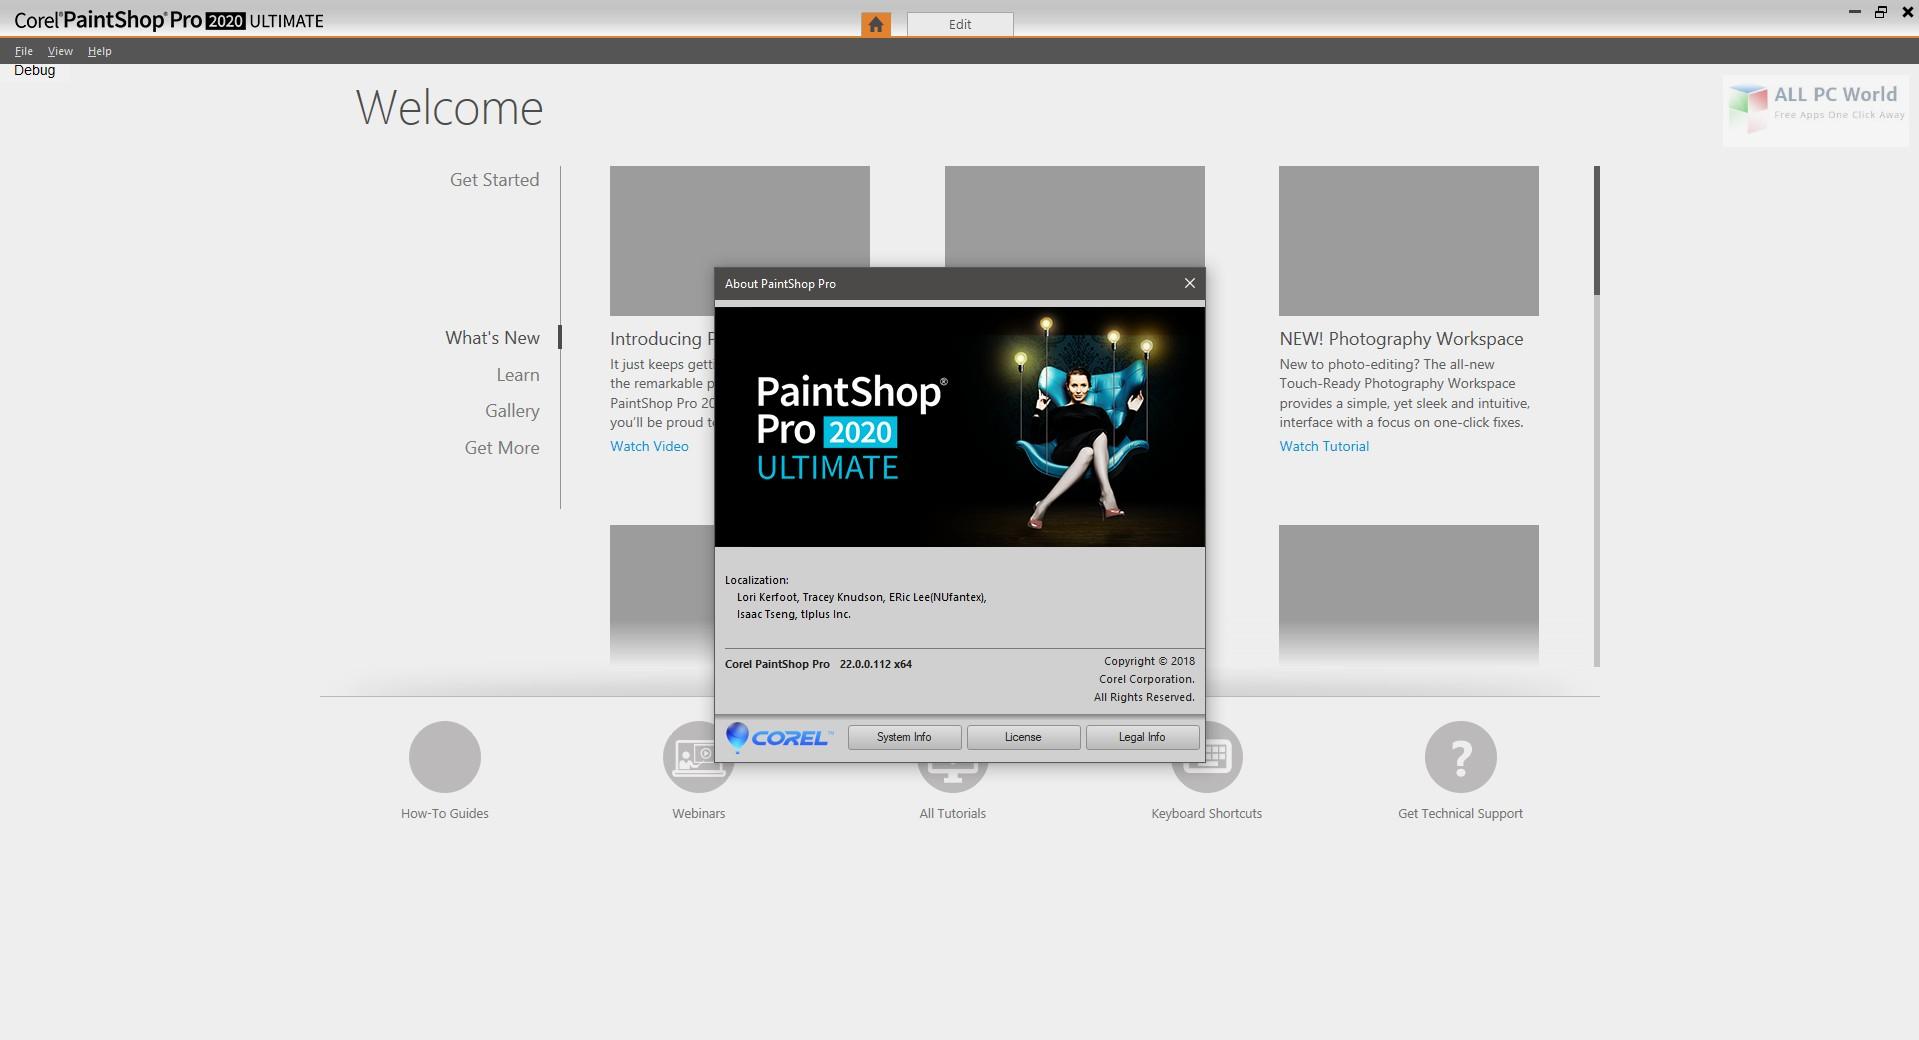 Corel PaintShop Pro Ultimate 2020 v22.0 Free Download